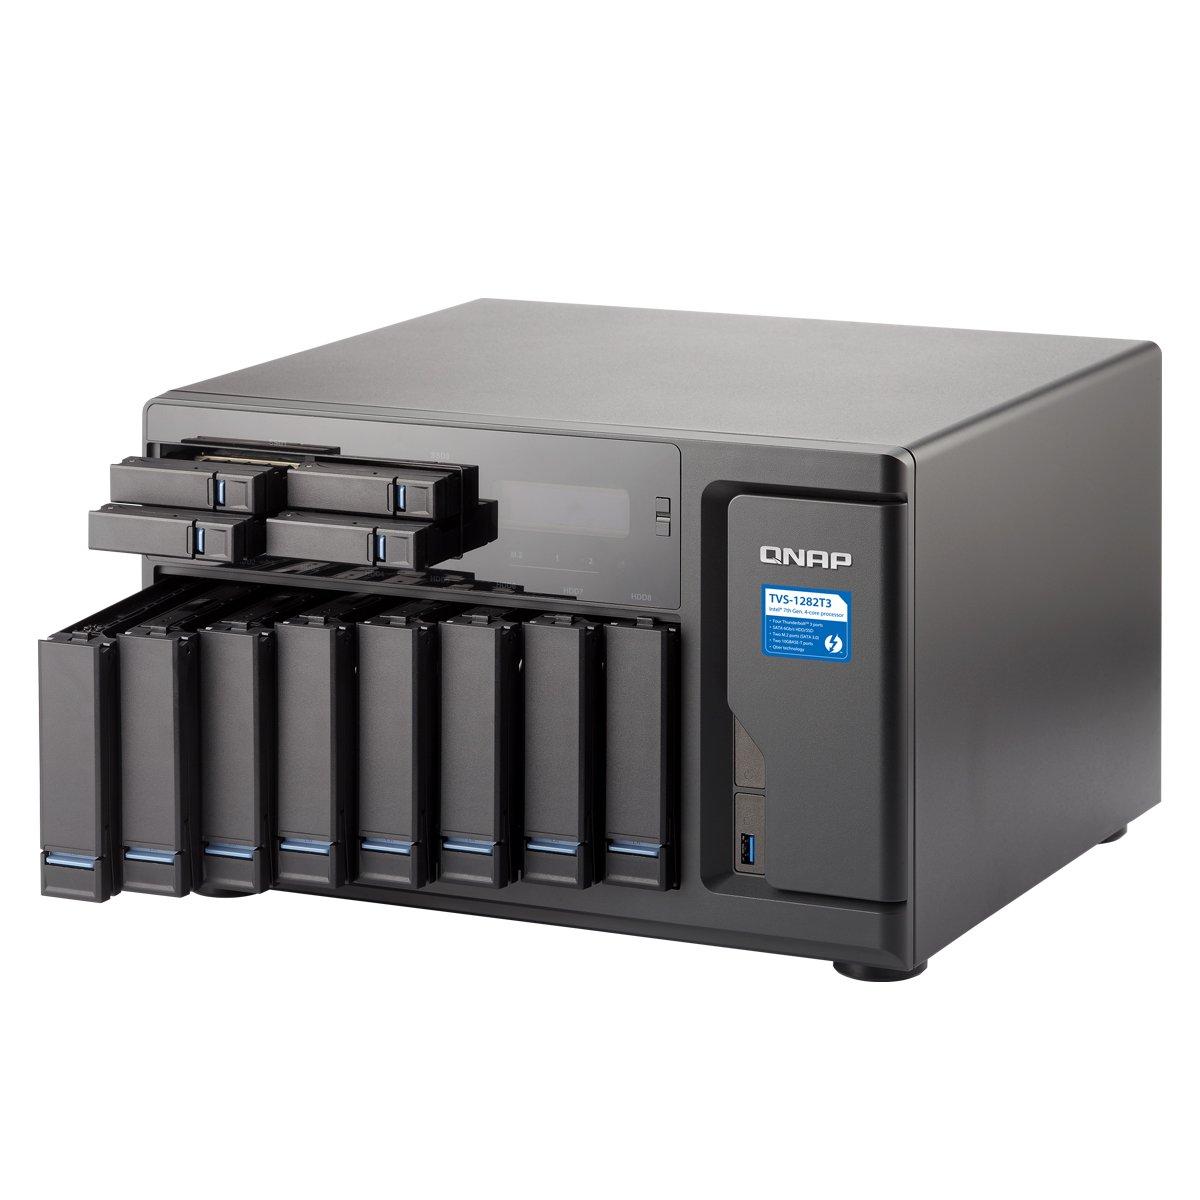 QNAP TVS-1282T3 Ultra-High Speed 12 Bay (8+4) Thunderbolt 3 NAS/iSCSI  IP-SAN  Intel 7th Gen Kaby Lake Core Thunderbolt3 Port x 4 and 10Gbase-T x 2